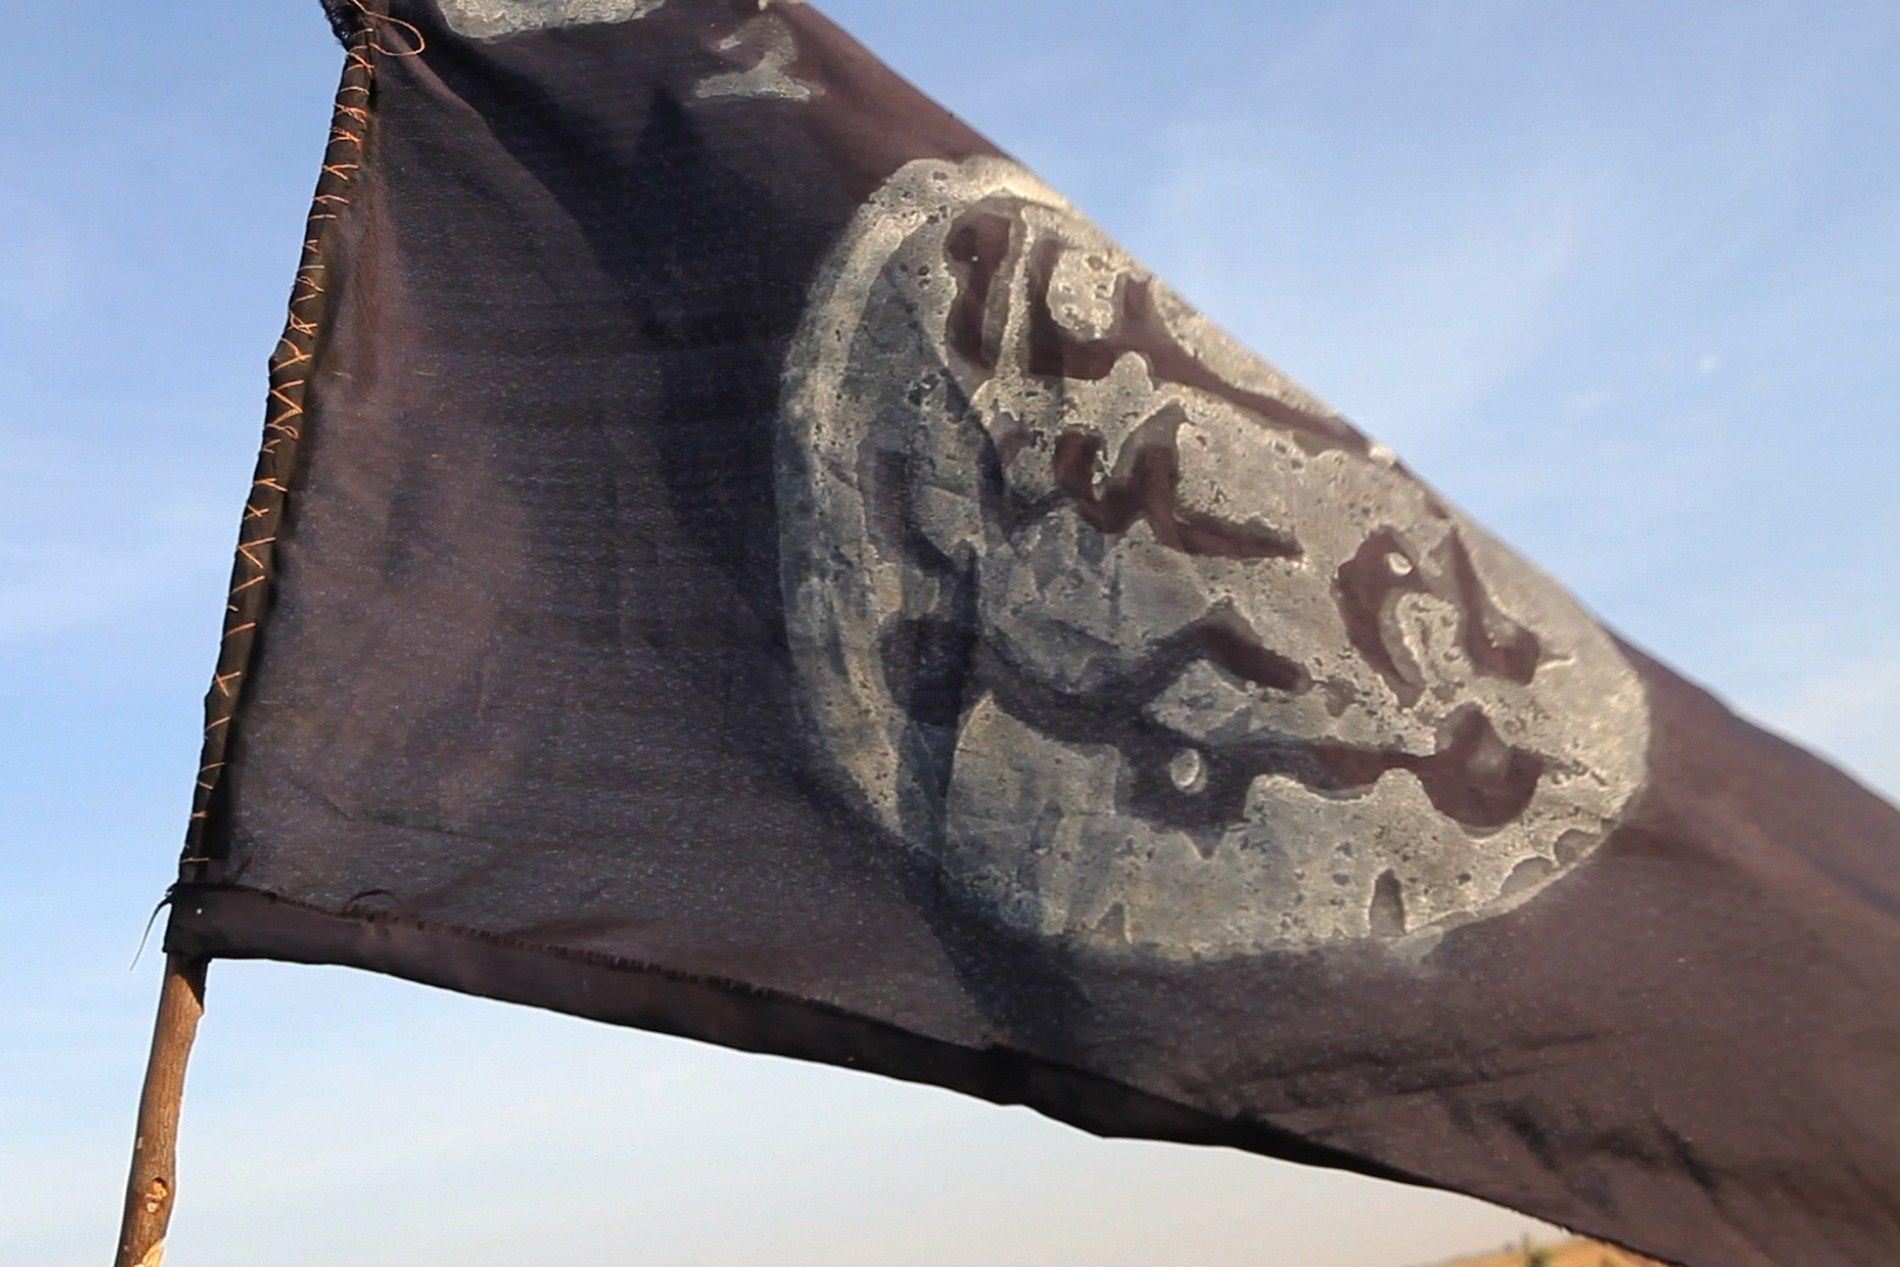 Boko Haram flag in Nigeria.